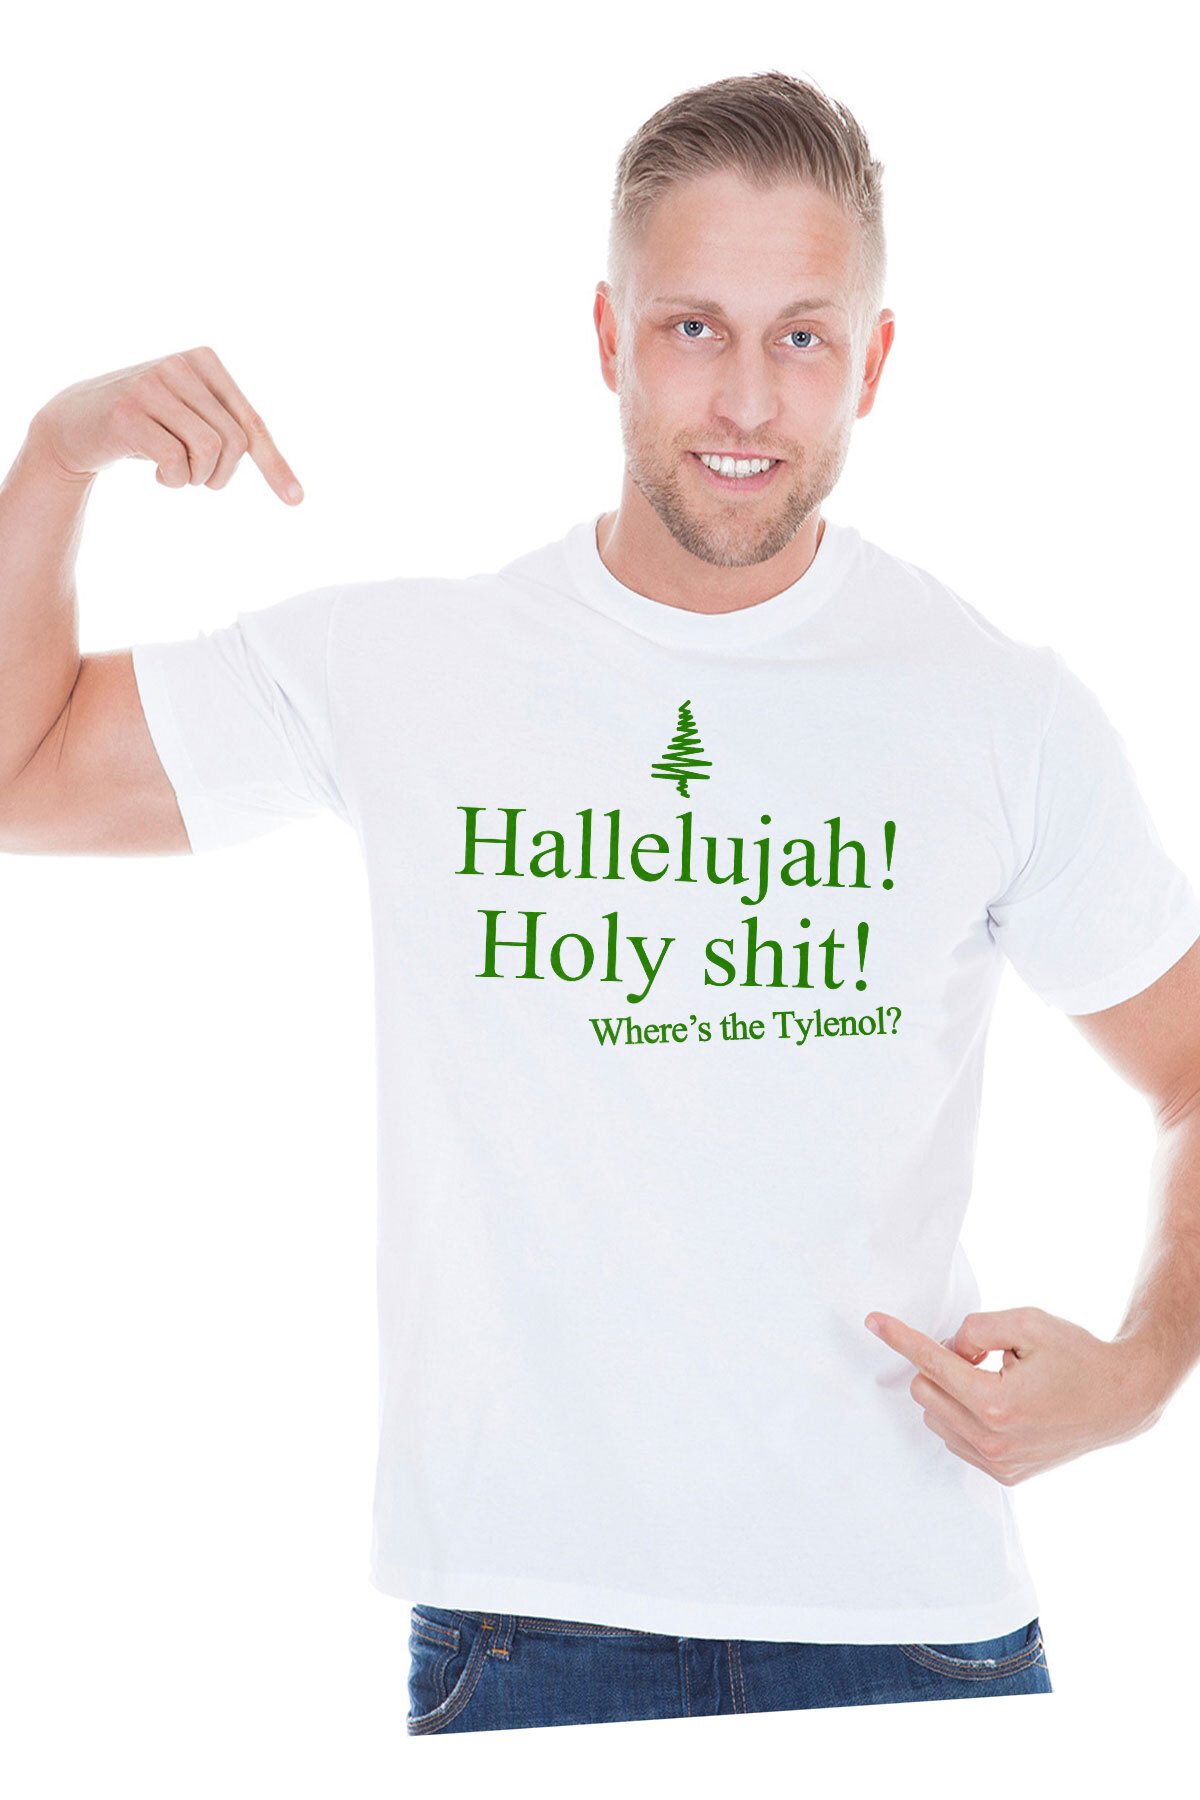 Christmas Vacation Hallelujah.Hallelujah Holy Shit Where S The Tylenol Christmas